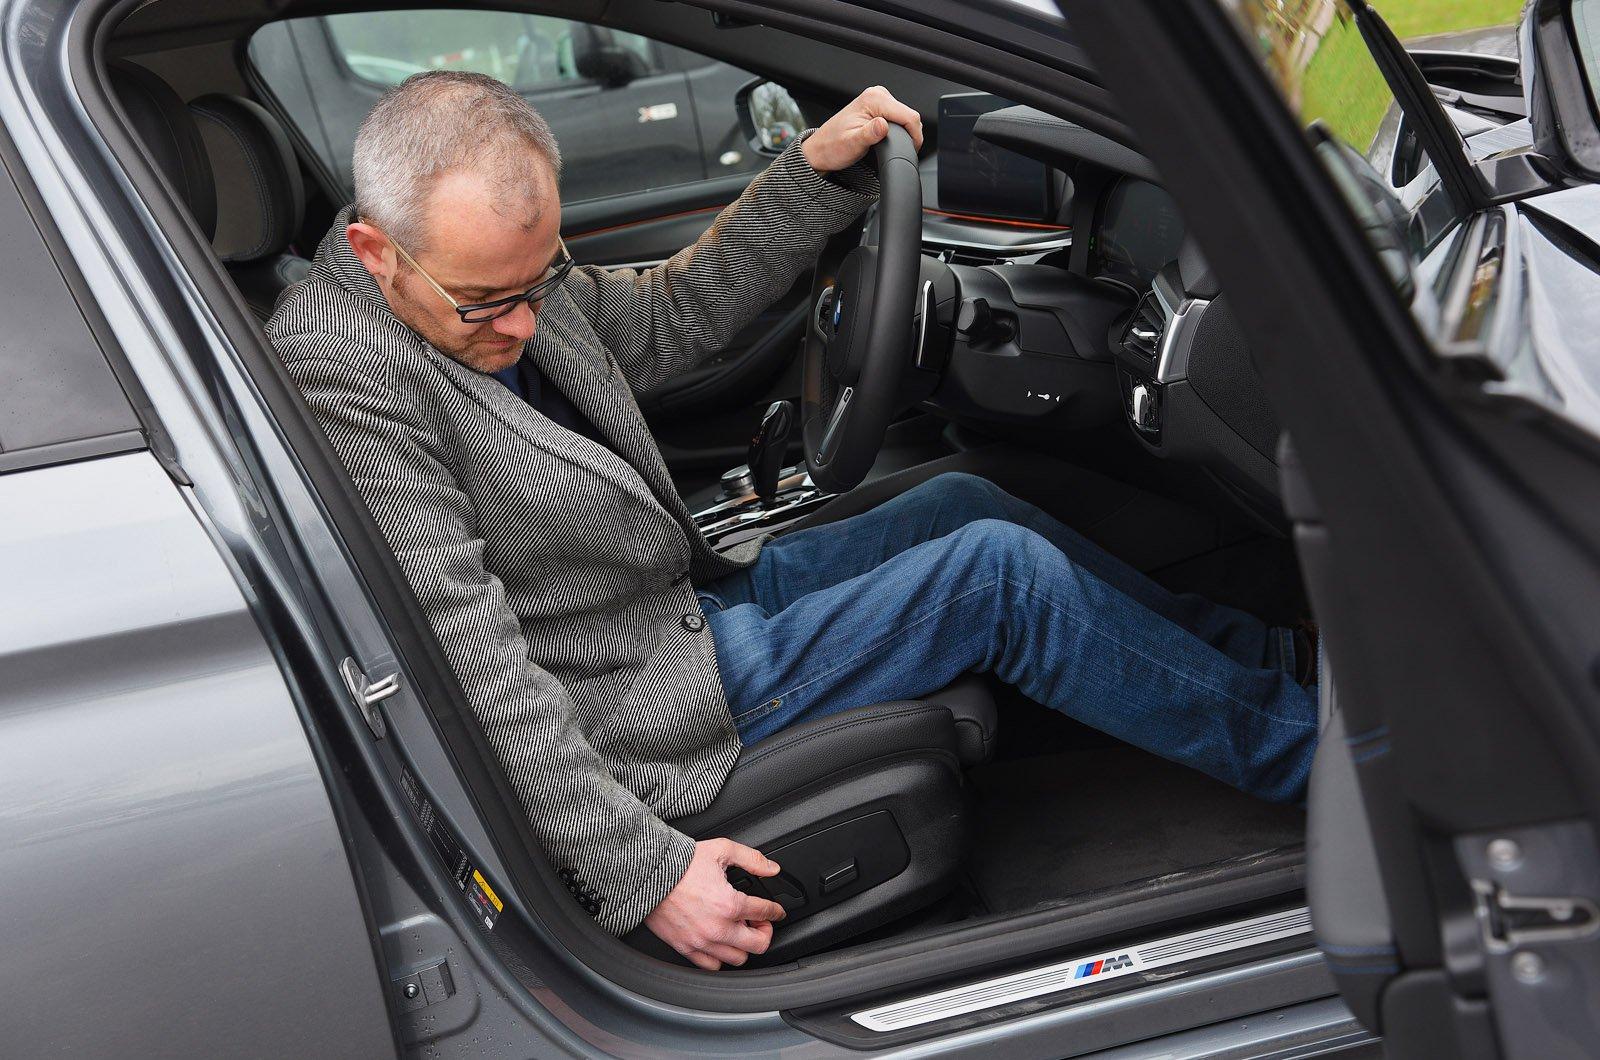 LT BMW 530e adjusting seat